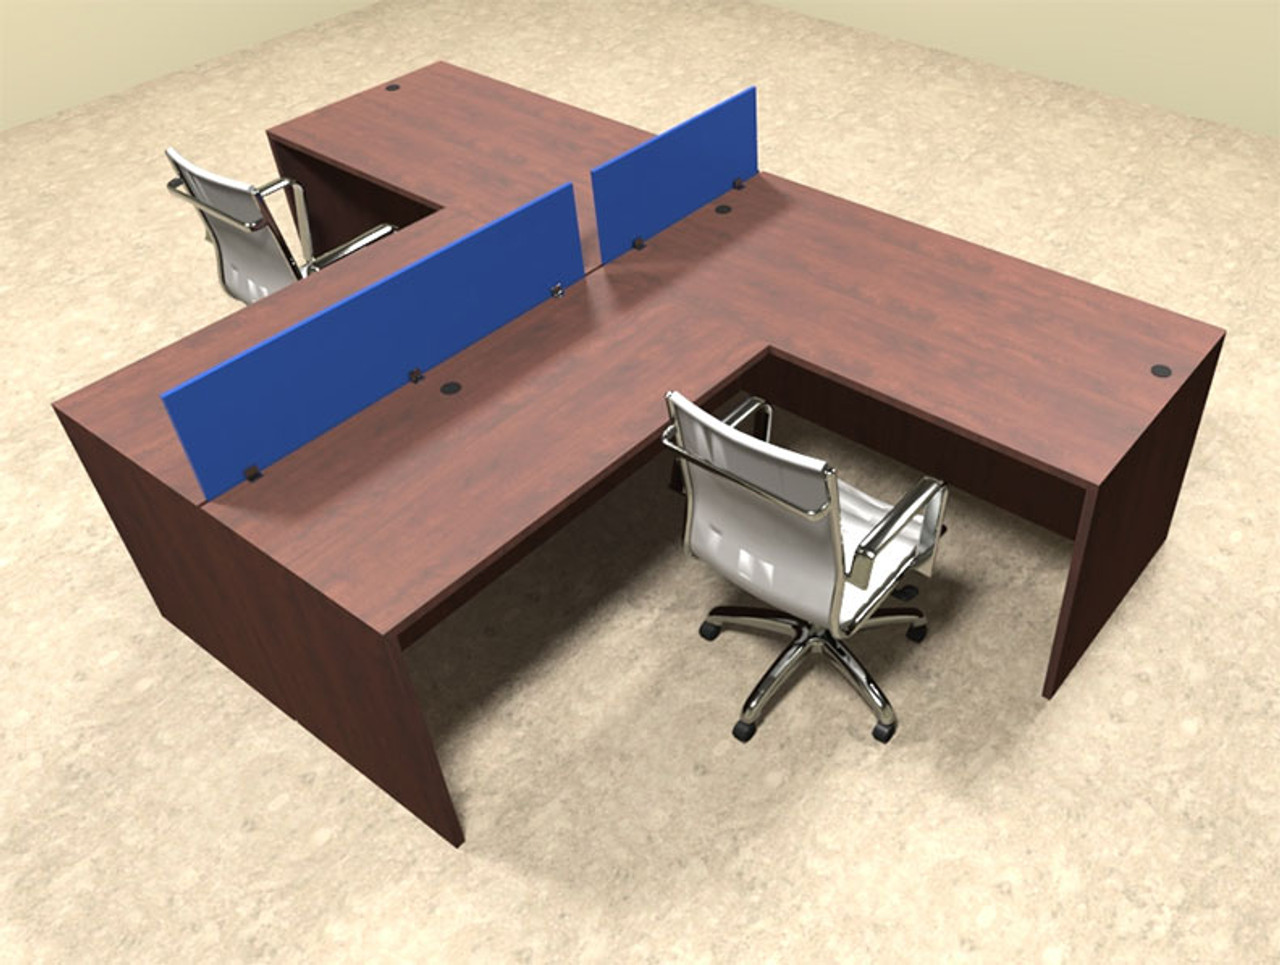 Two Person Blue Divider Office Workstation Desk Set, #OT-SUL-SPB42